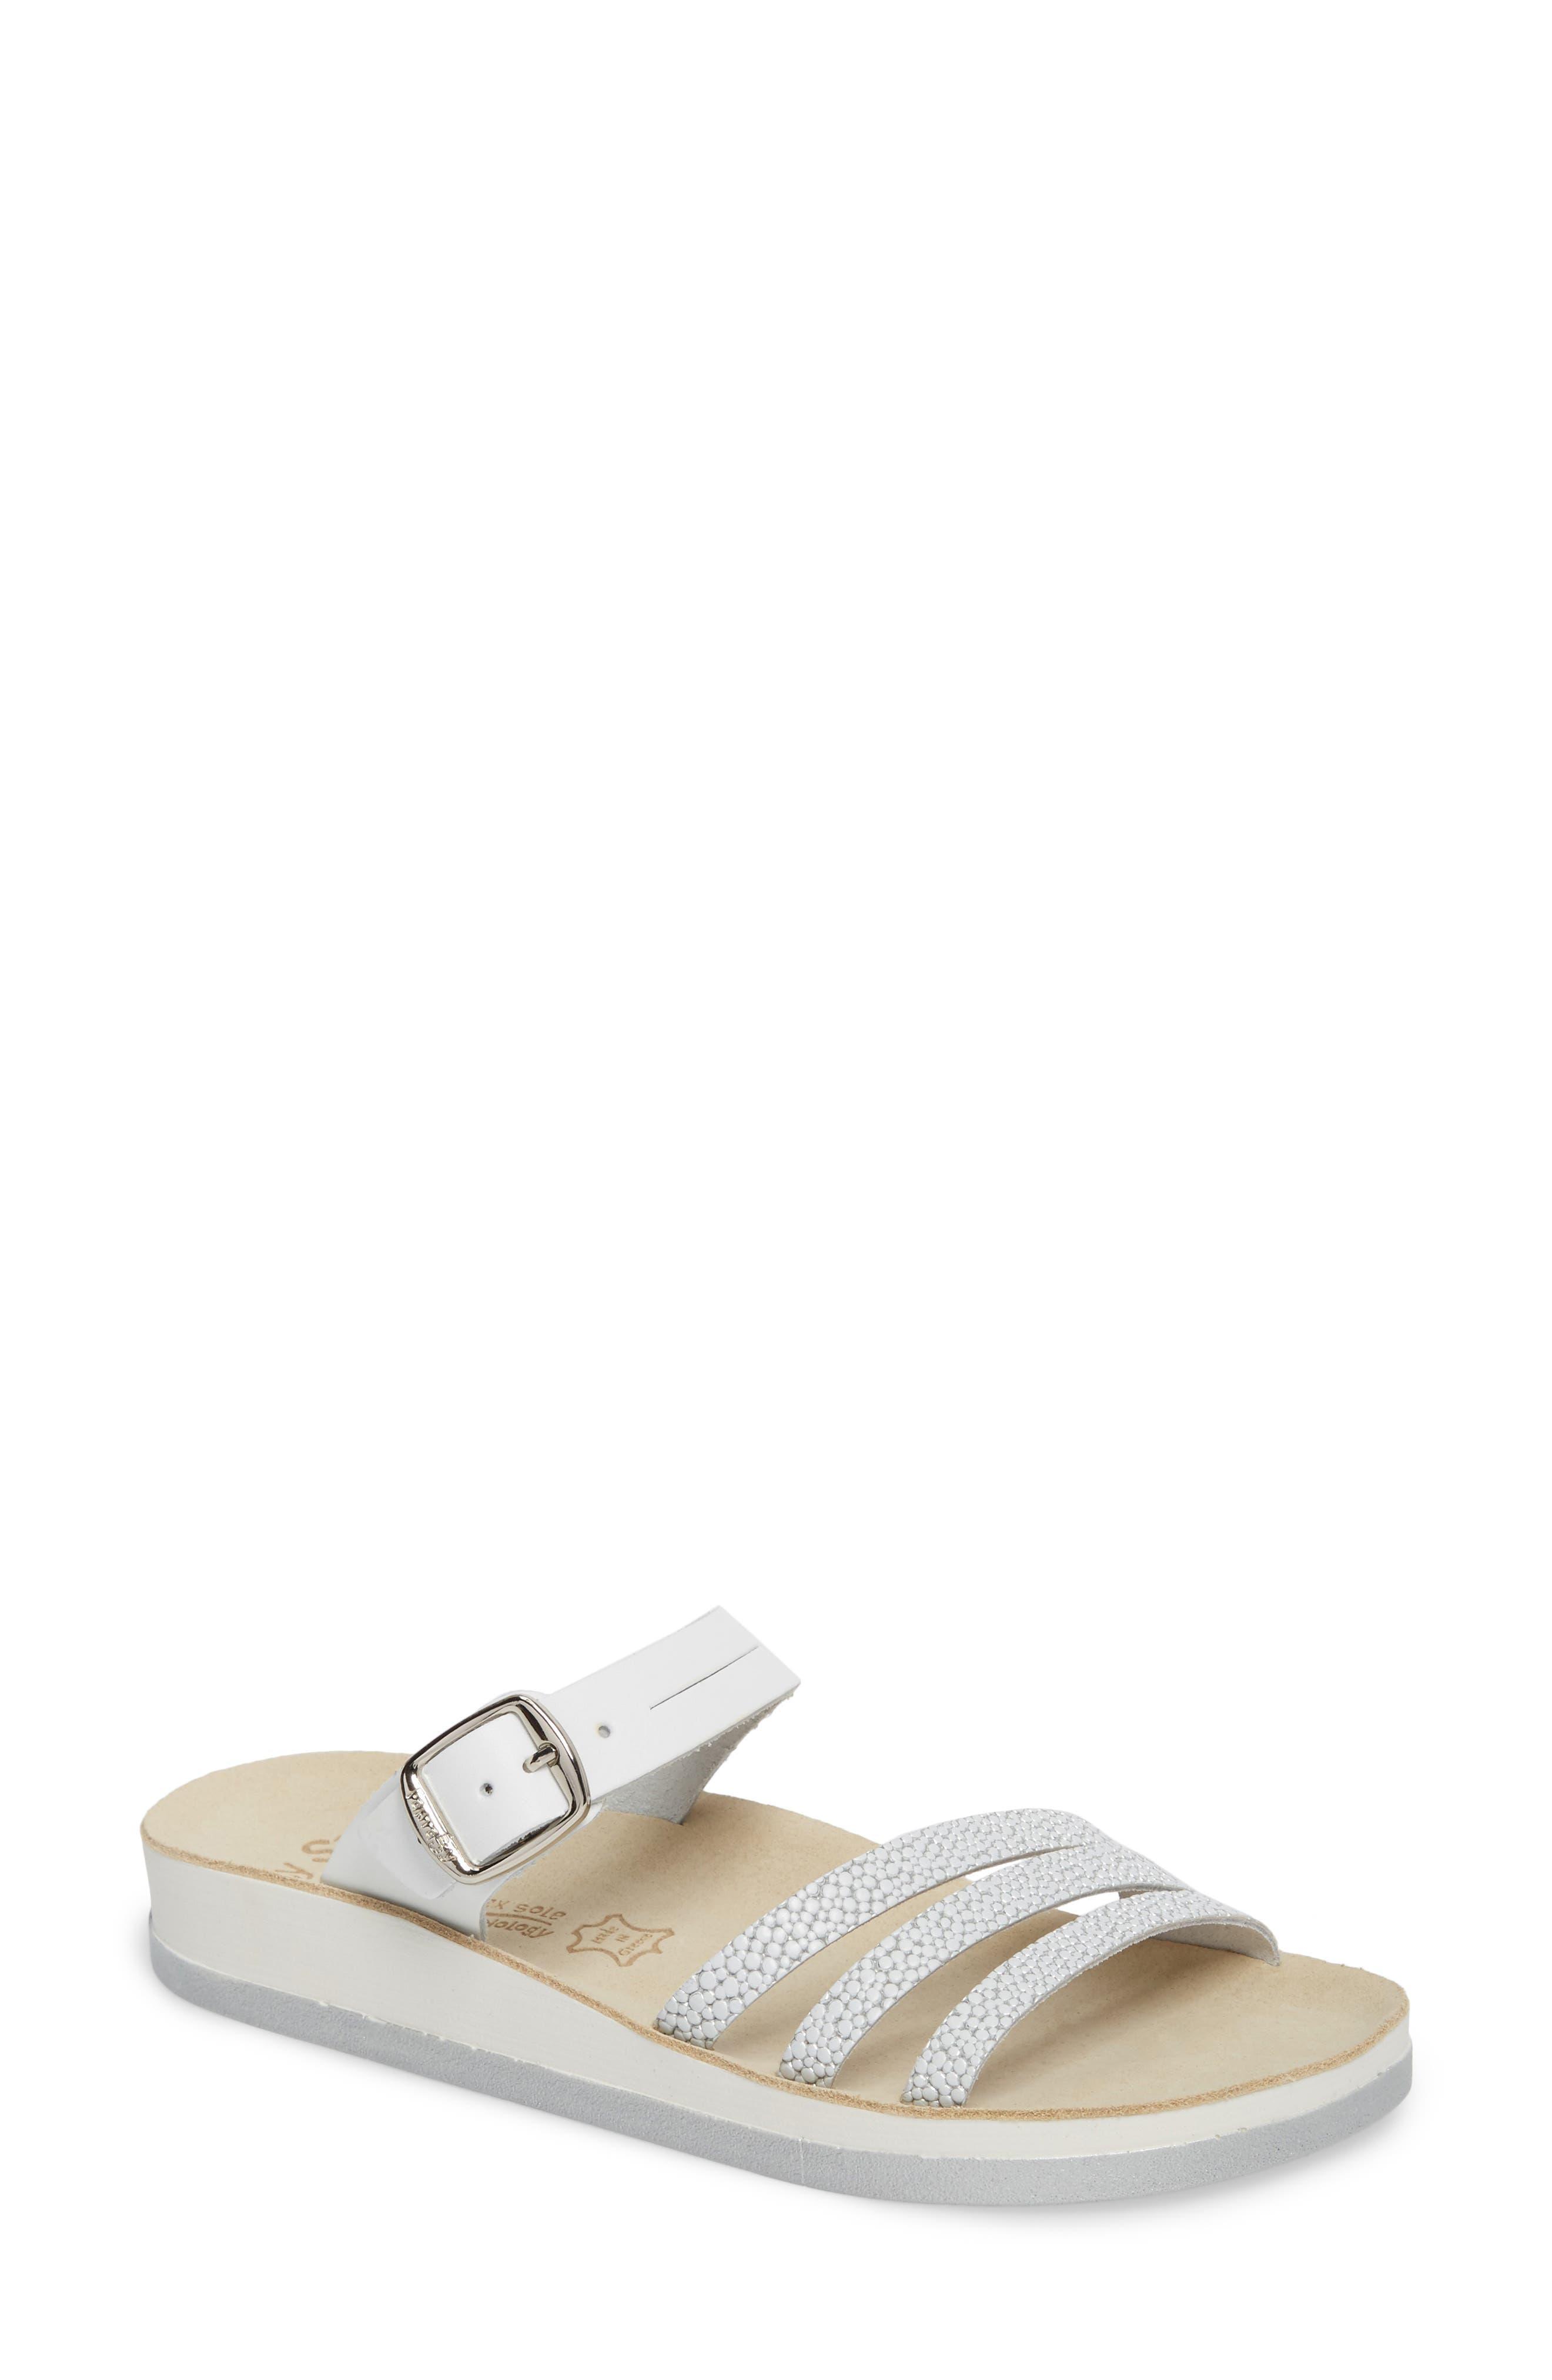 Lola Sandal,                             Main thumbnail 1, color,                             White/ Silver Leather